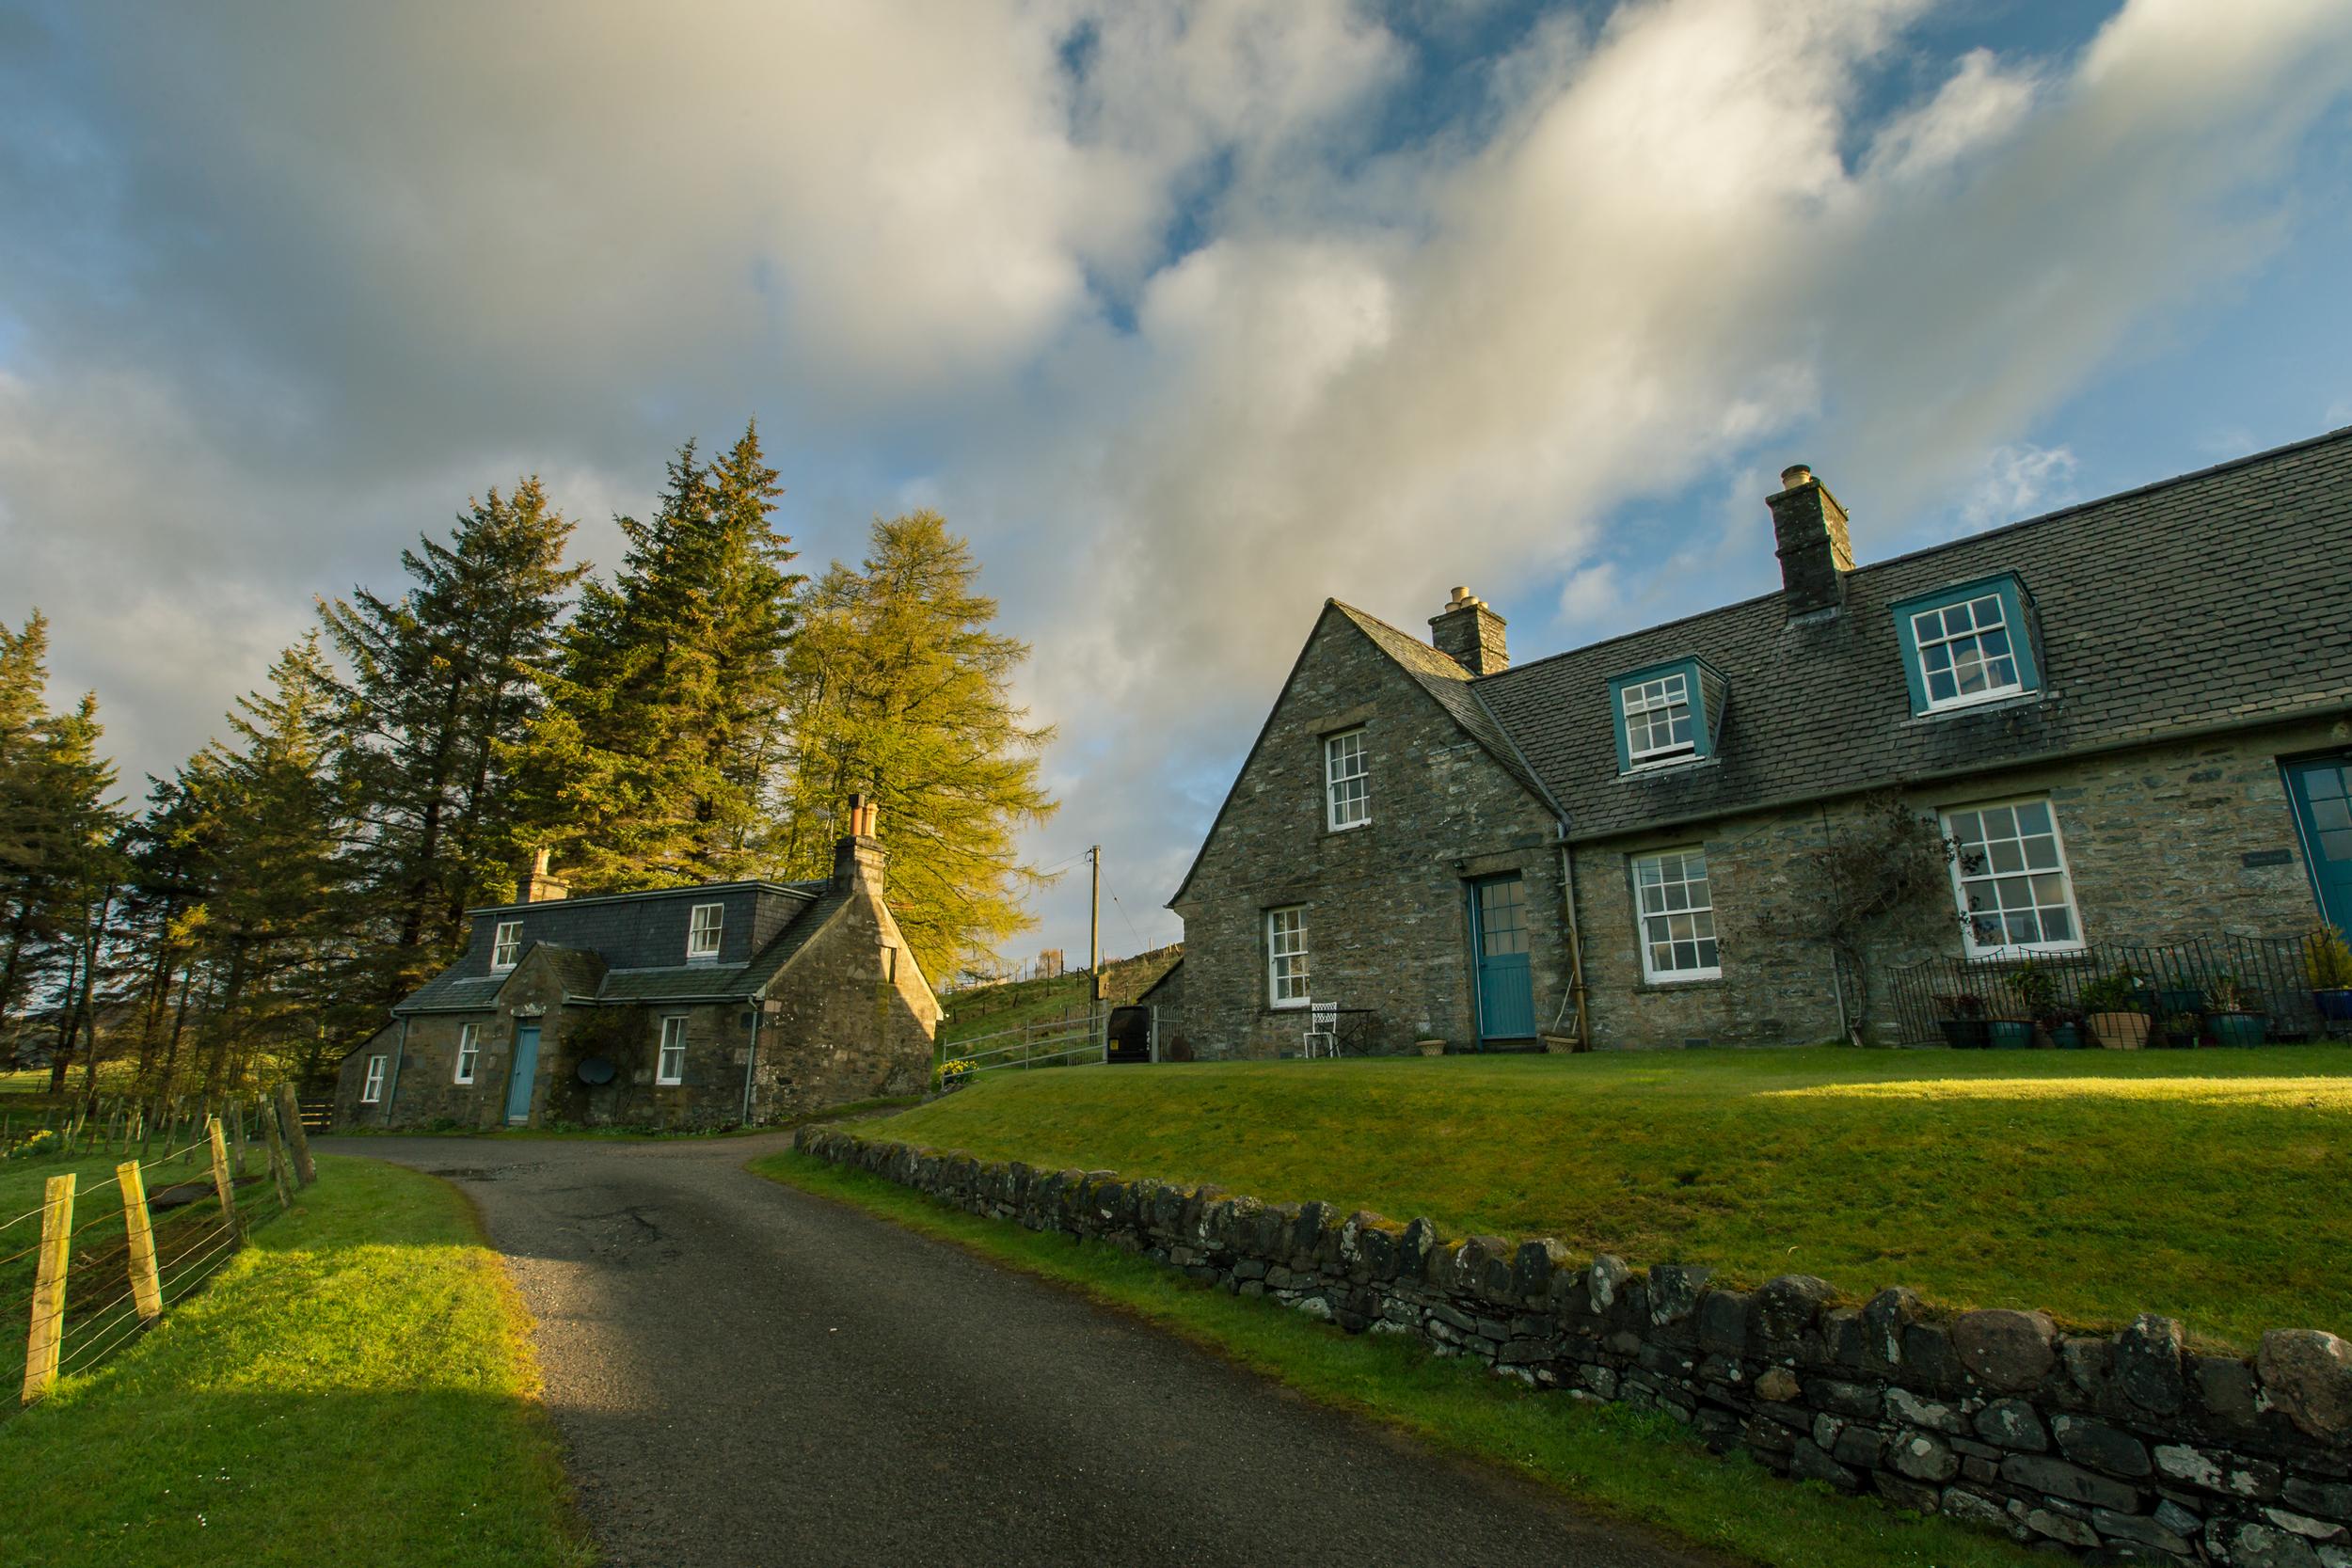 ©jennifer bailey 2015 tirinie cottage, blair atholl, scotland